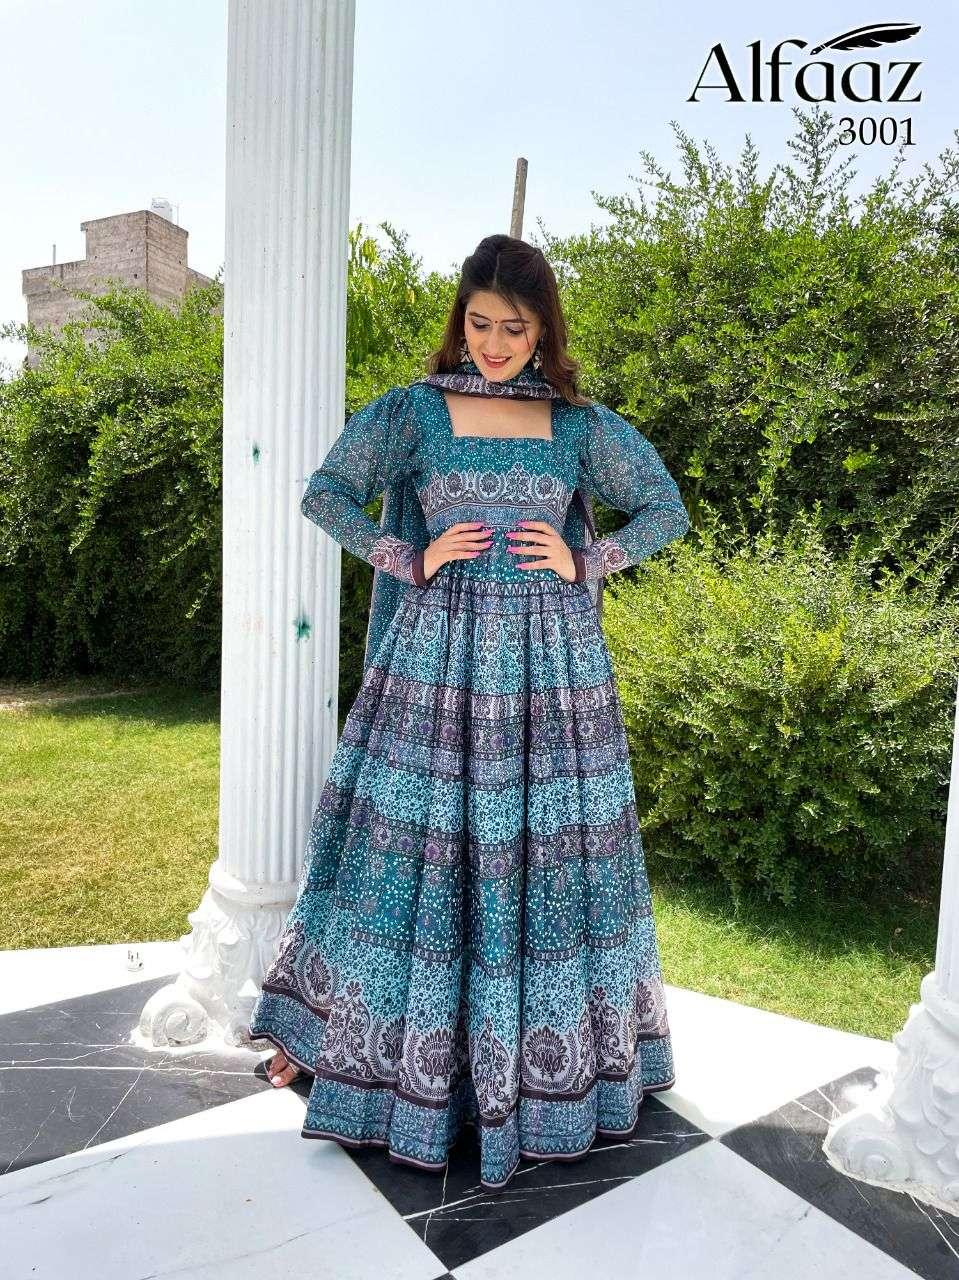 Stylishta Alfaaz Vol 3 Digital Printed Kurti Gown With Dupatta Set Collection